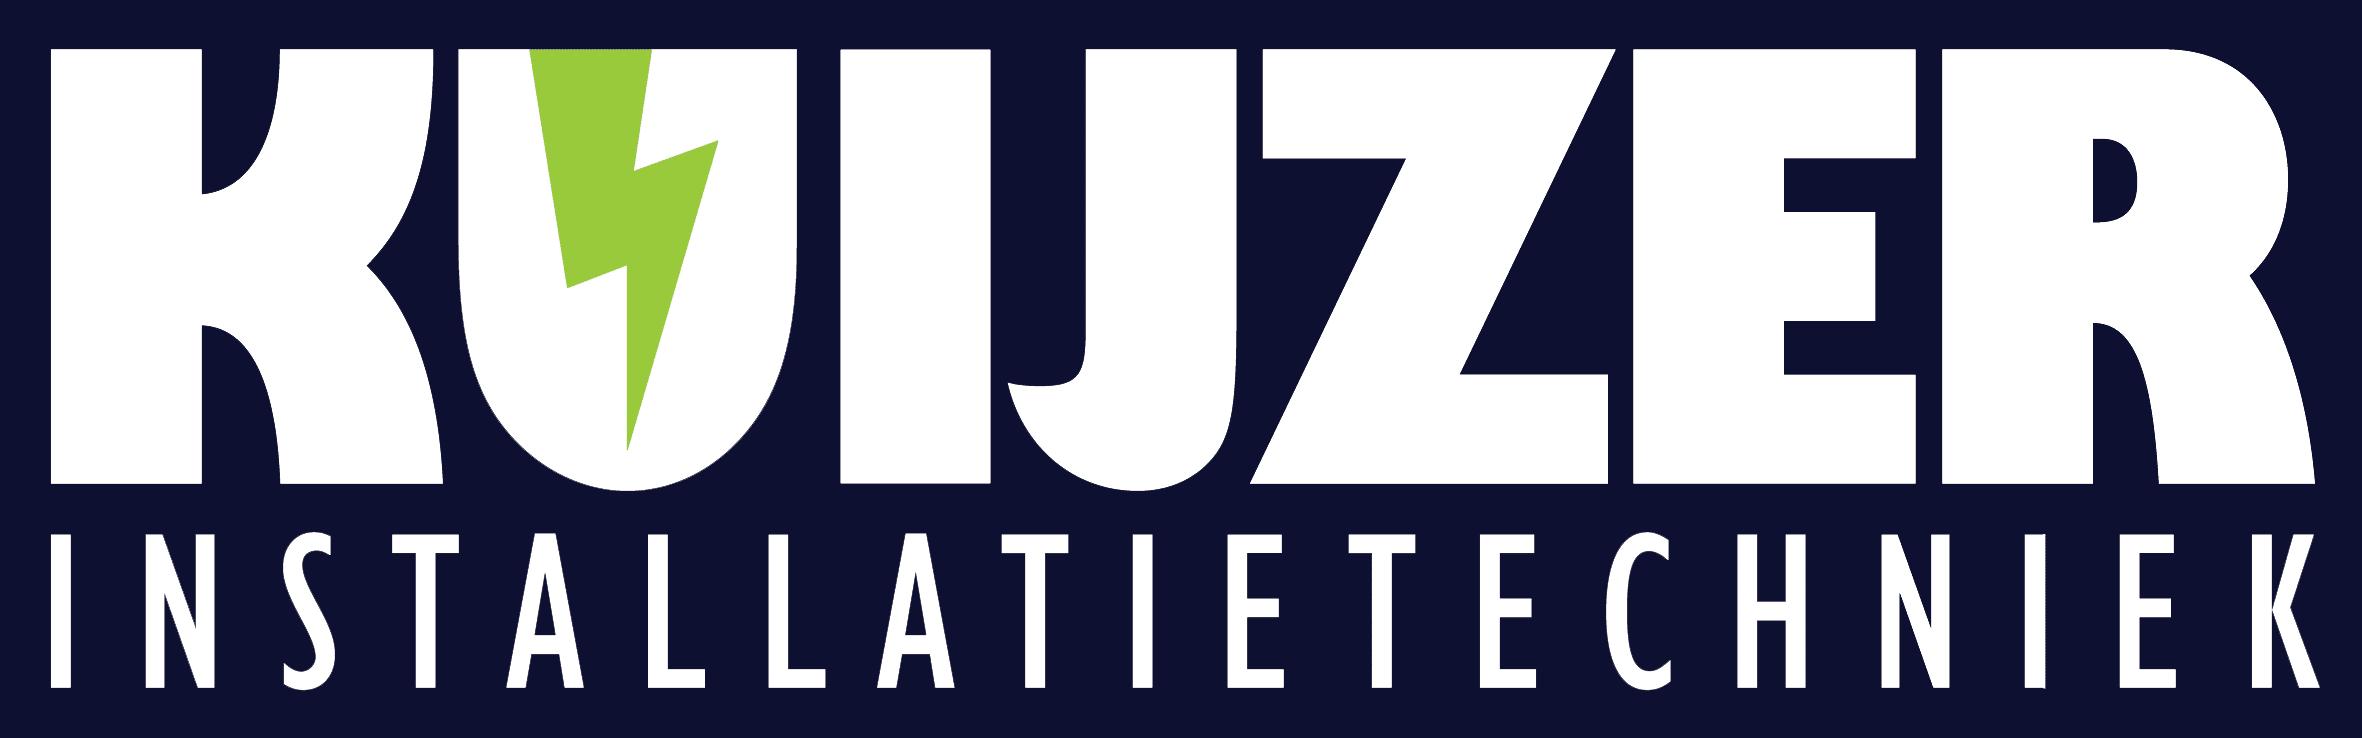 Kuijzer Logo